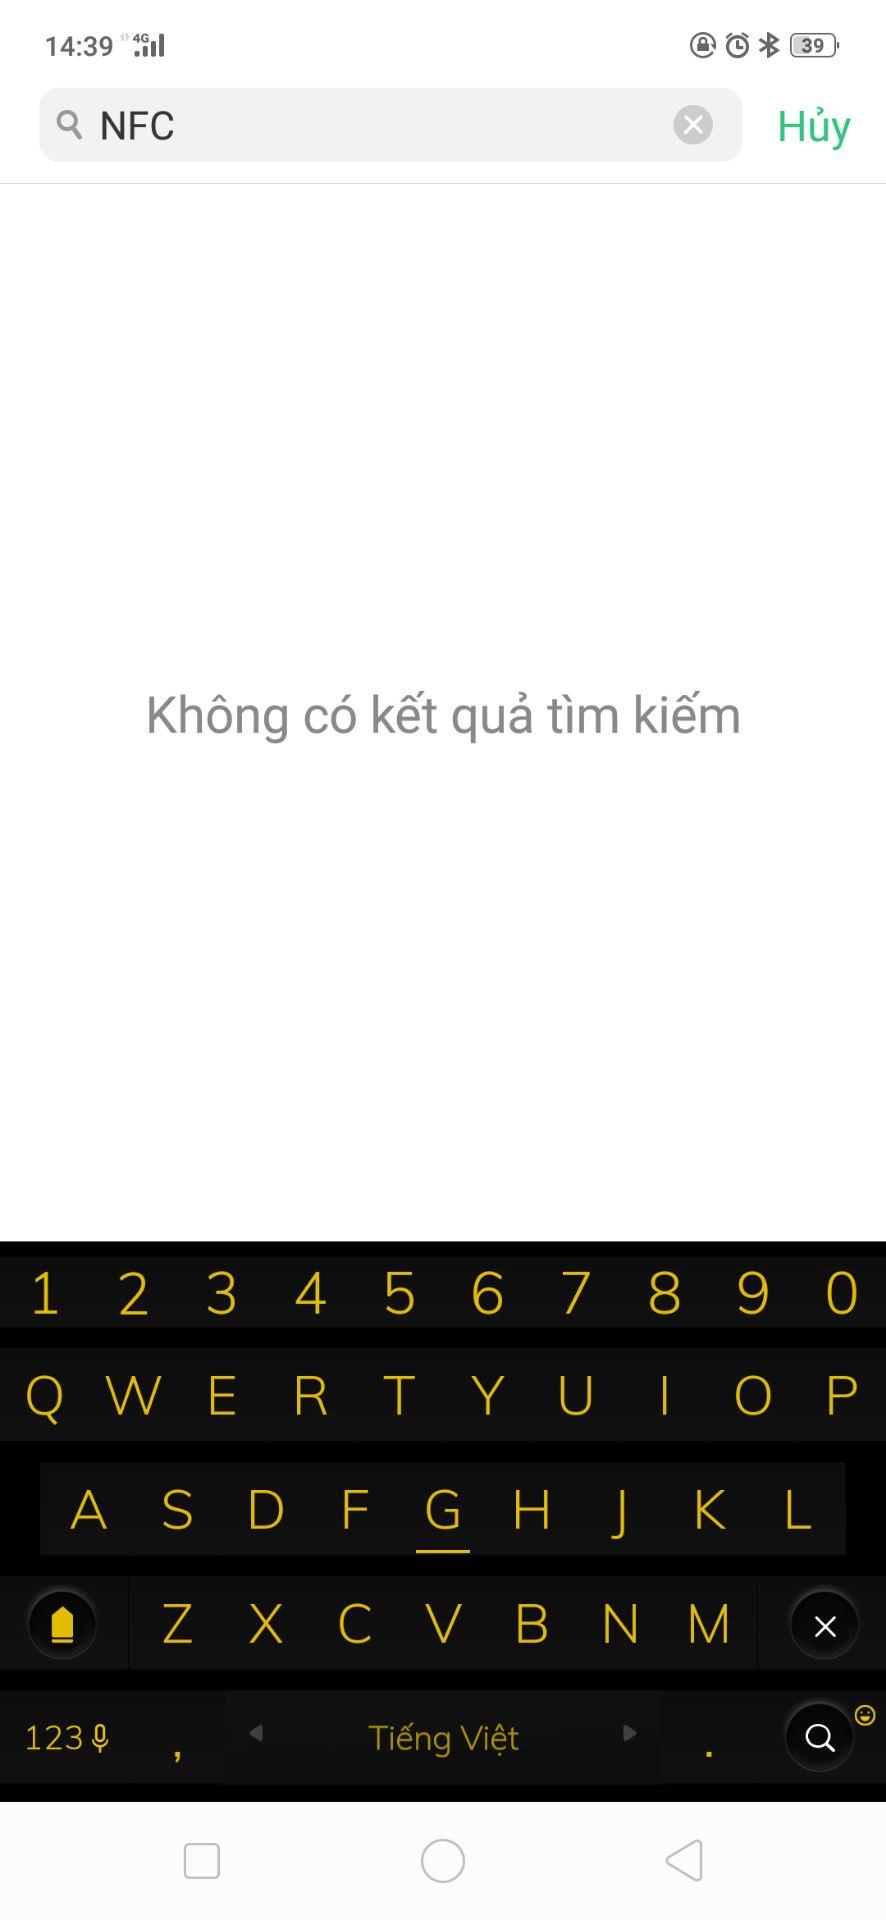 Lê Minh Huy